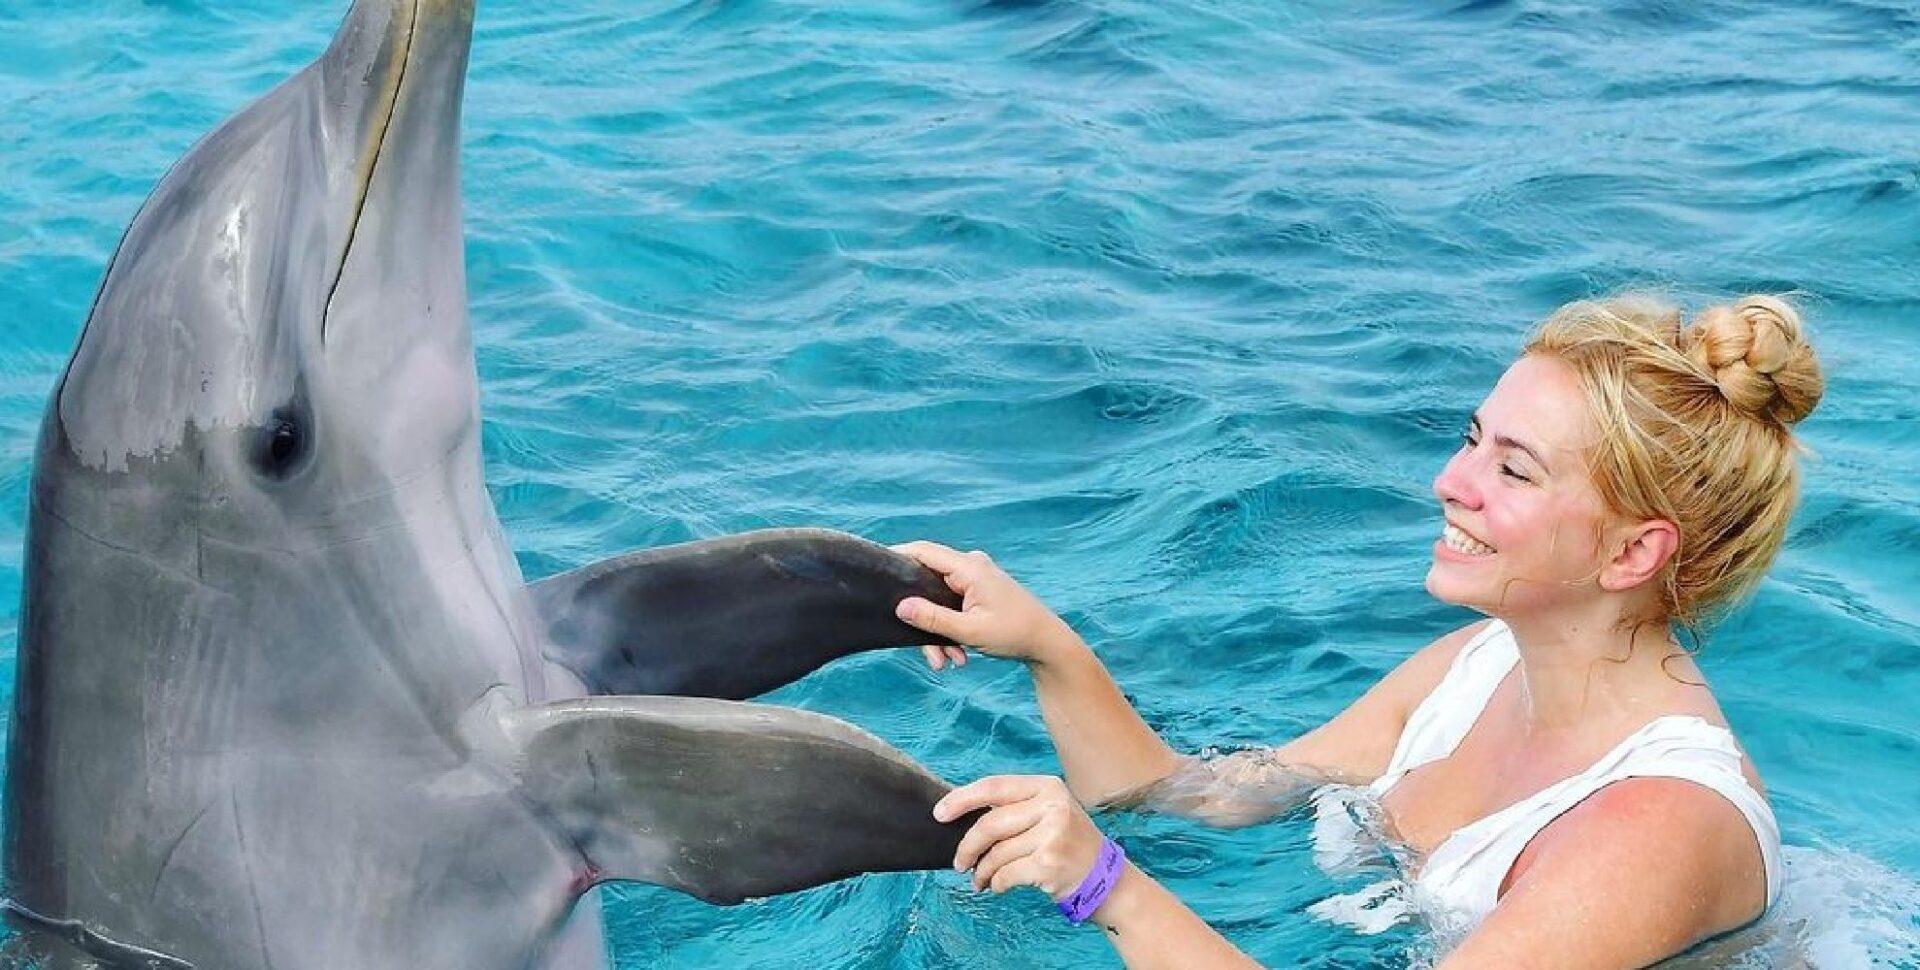 Sensi Lowe VI Instagram Vakantie Vriend